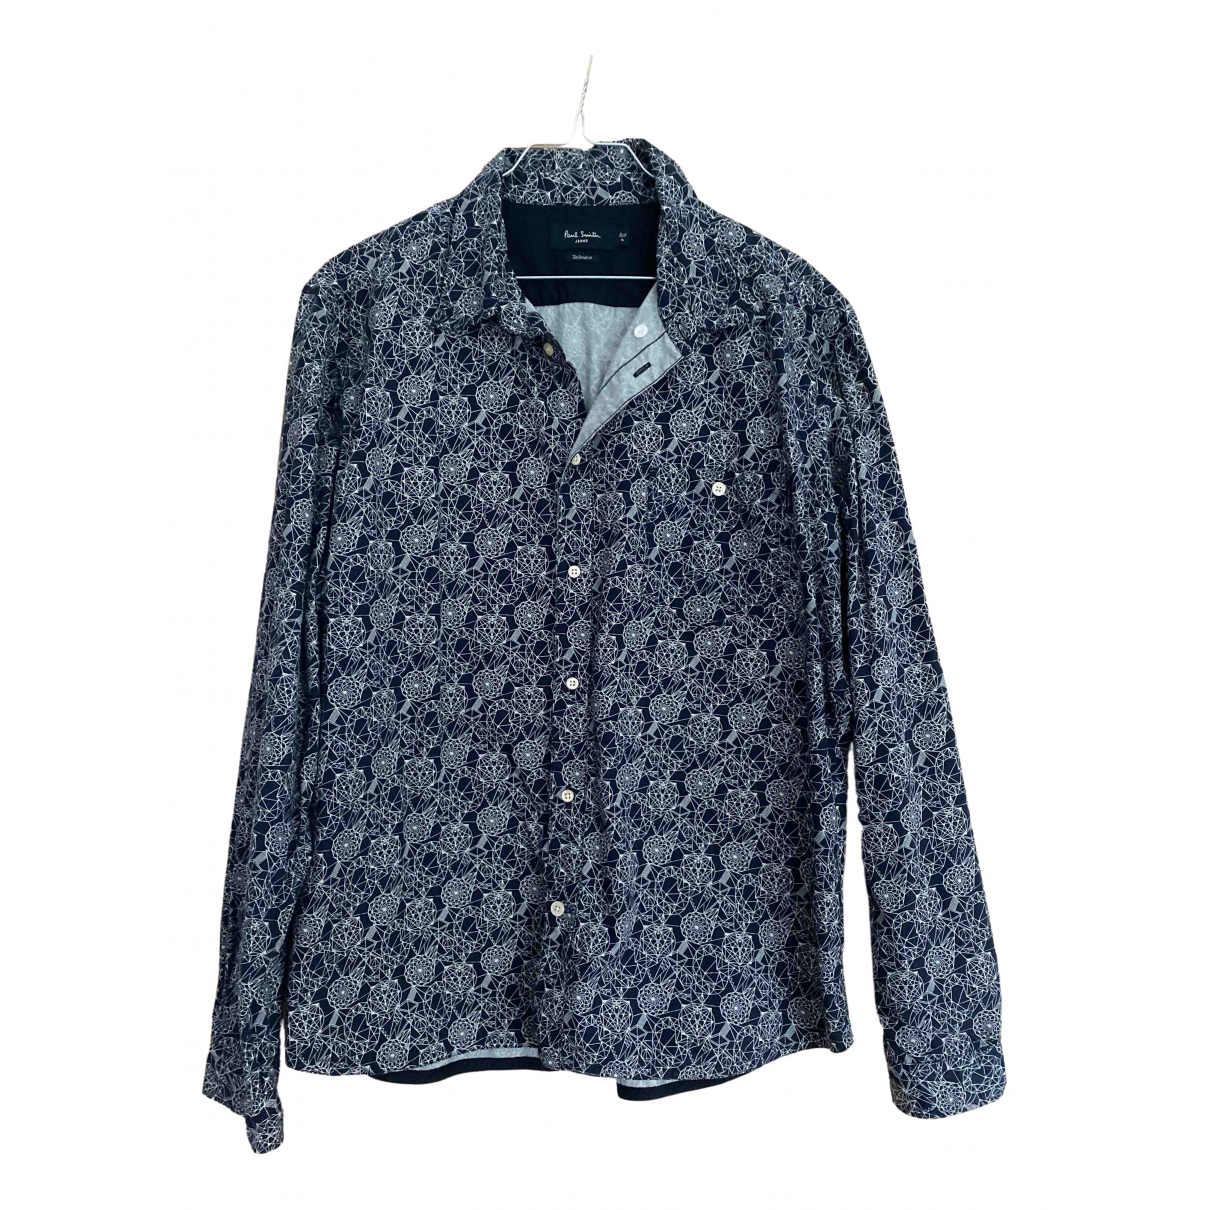 Paul Smith \N Hemden in  Marine Baumwolle